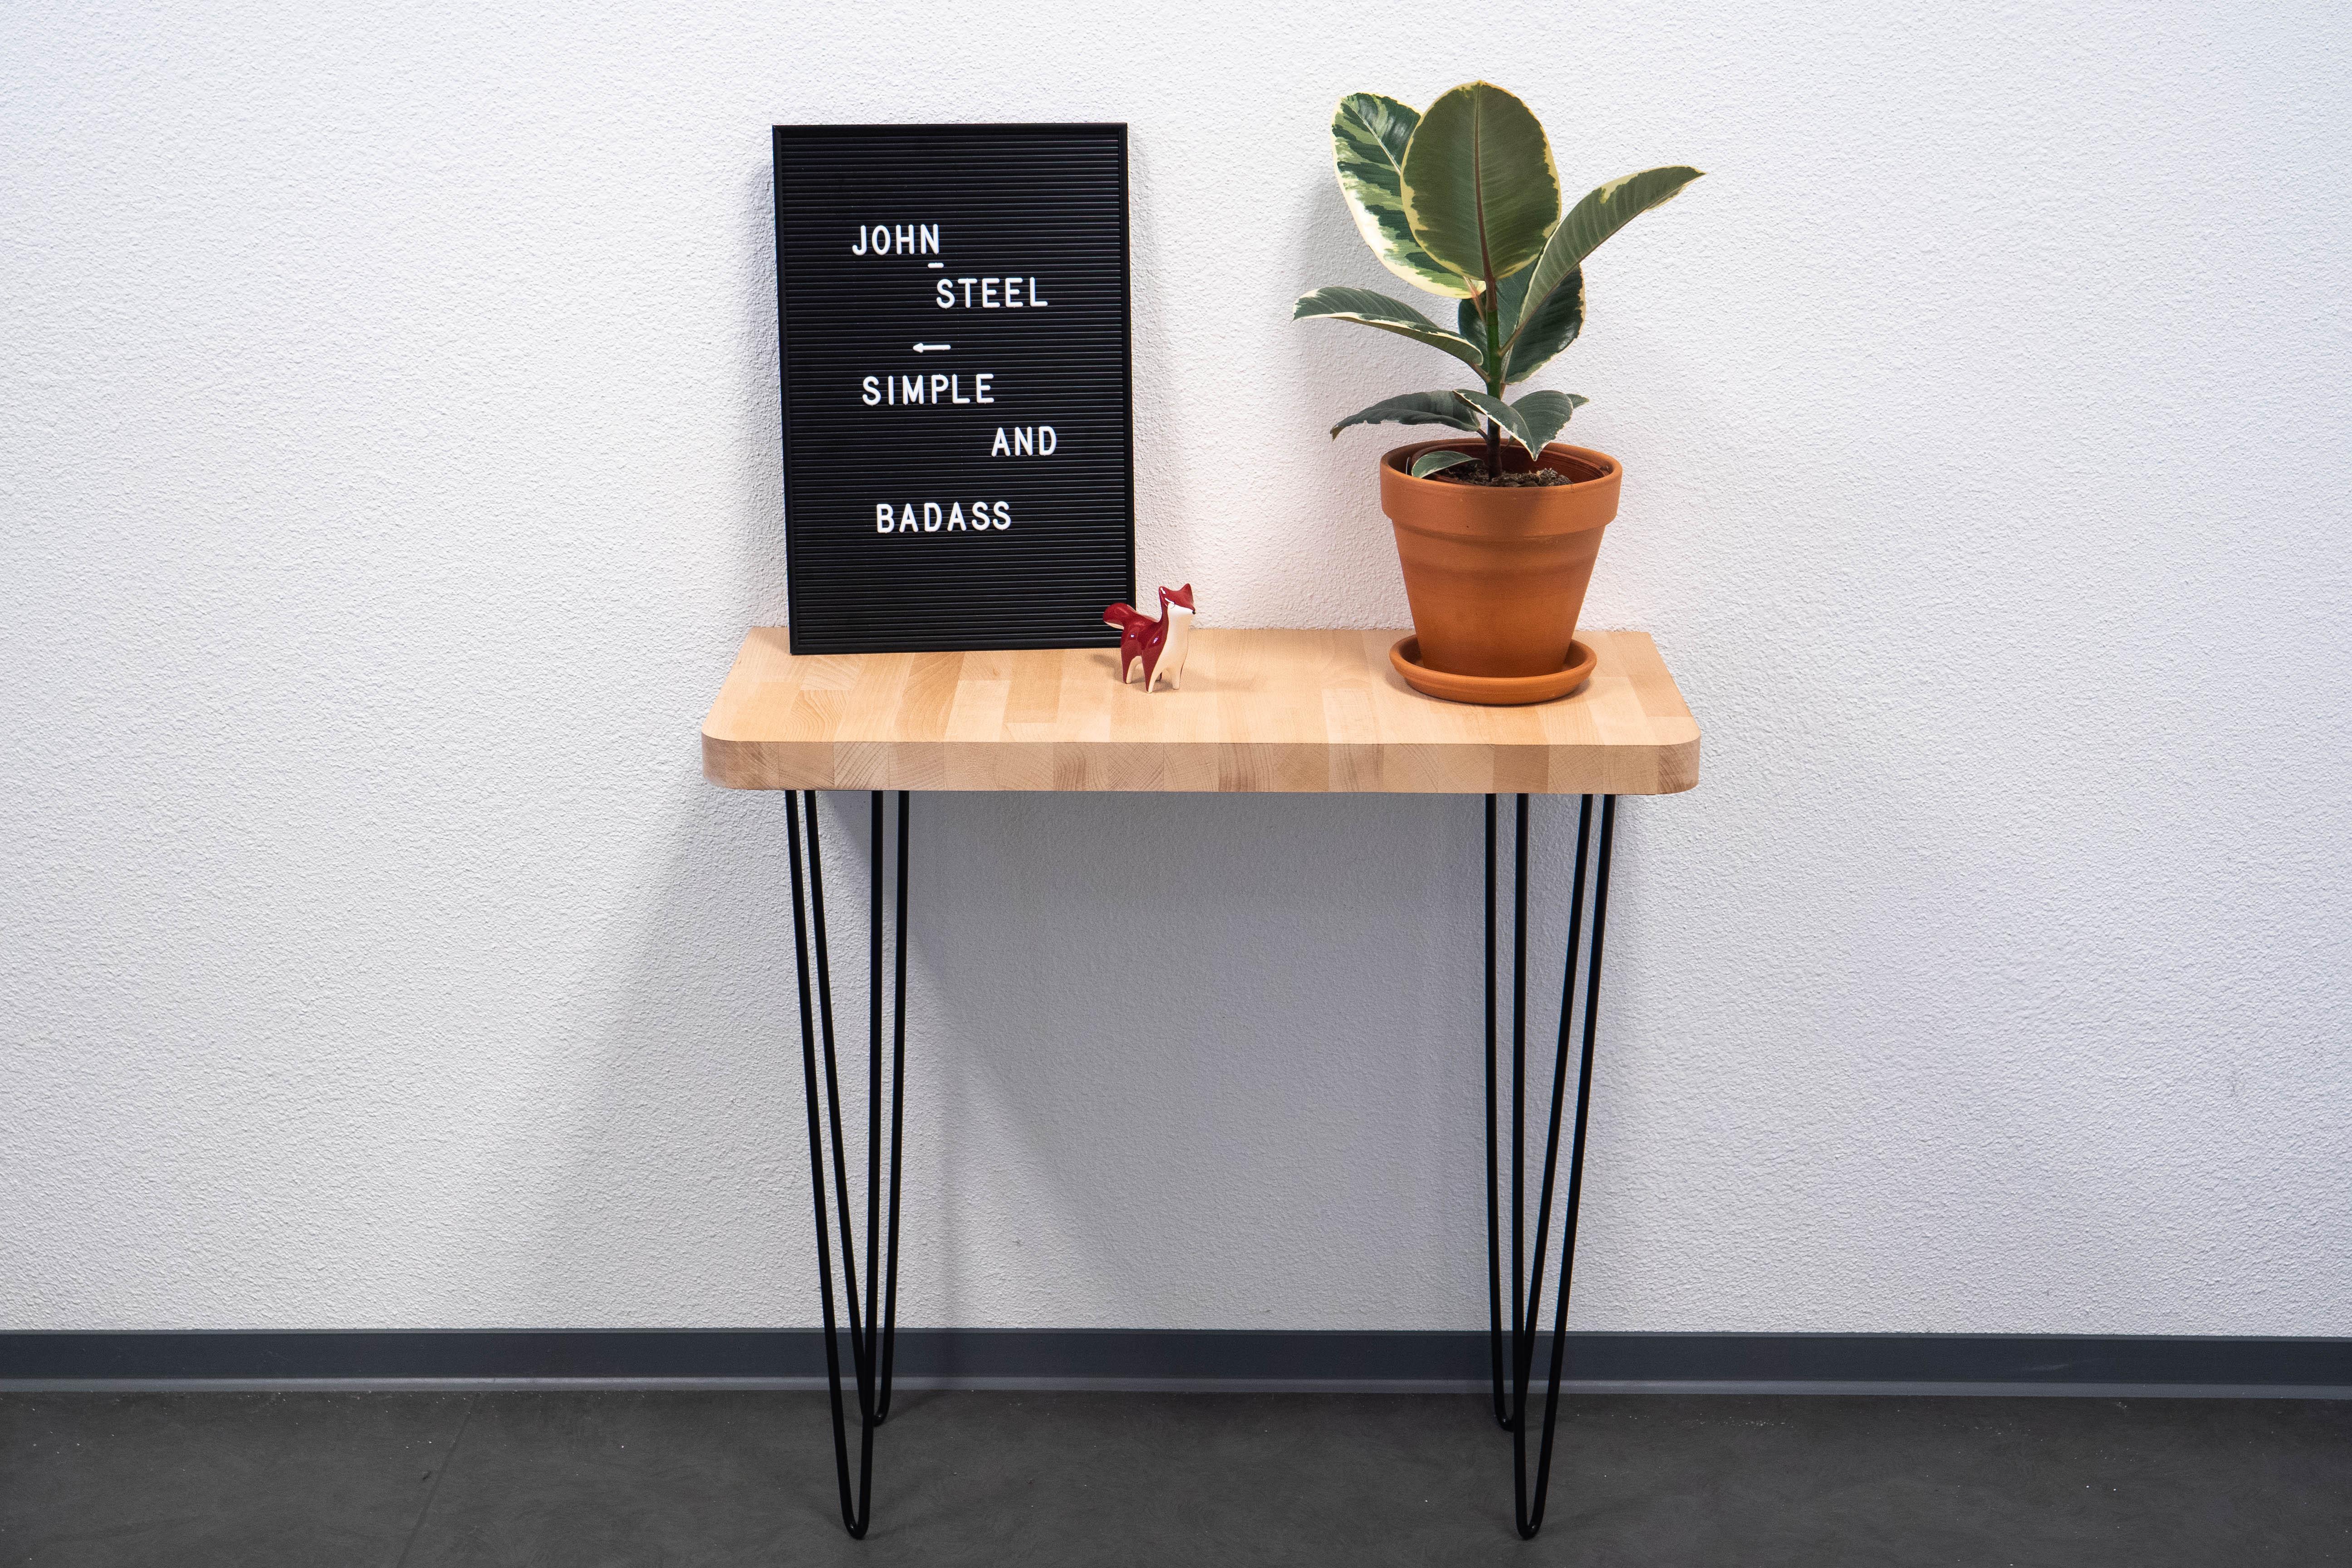 - Make a DIY custom solid wood side table